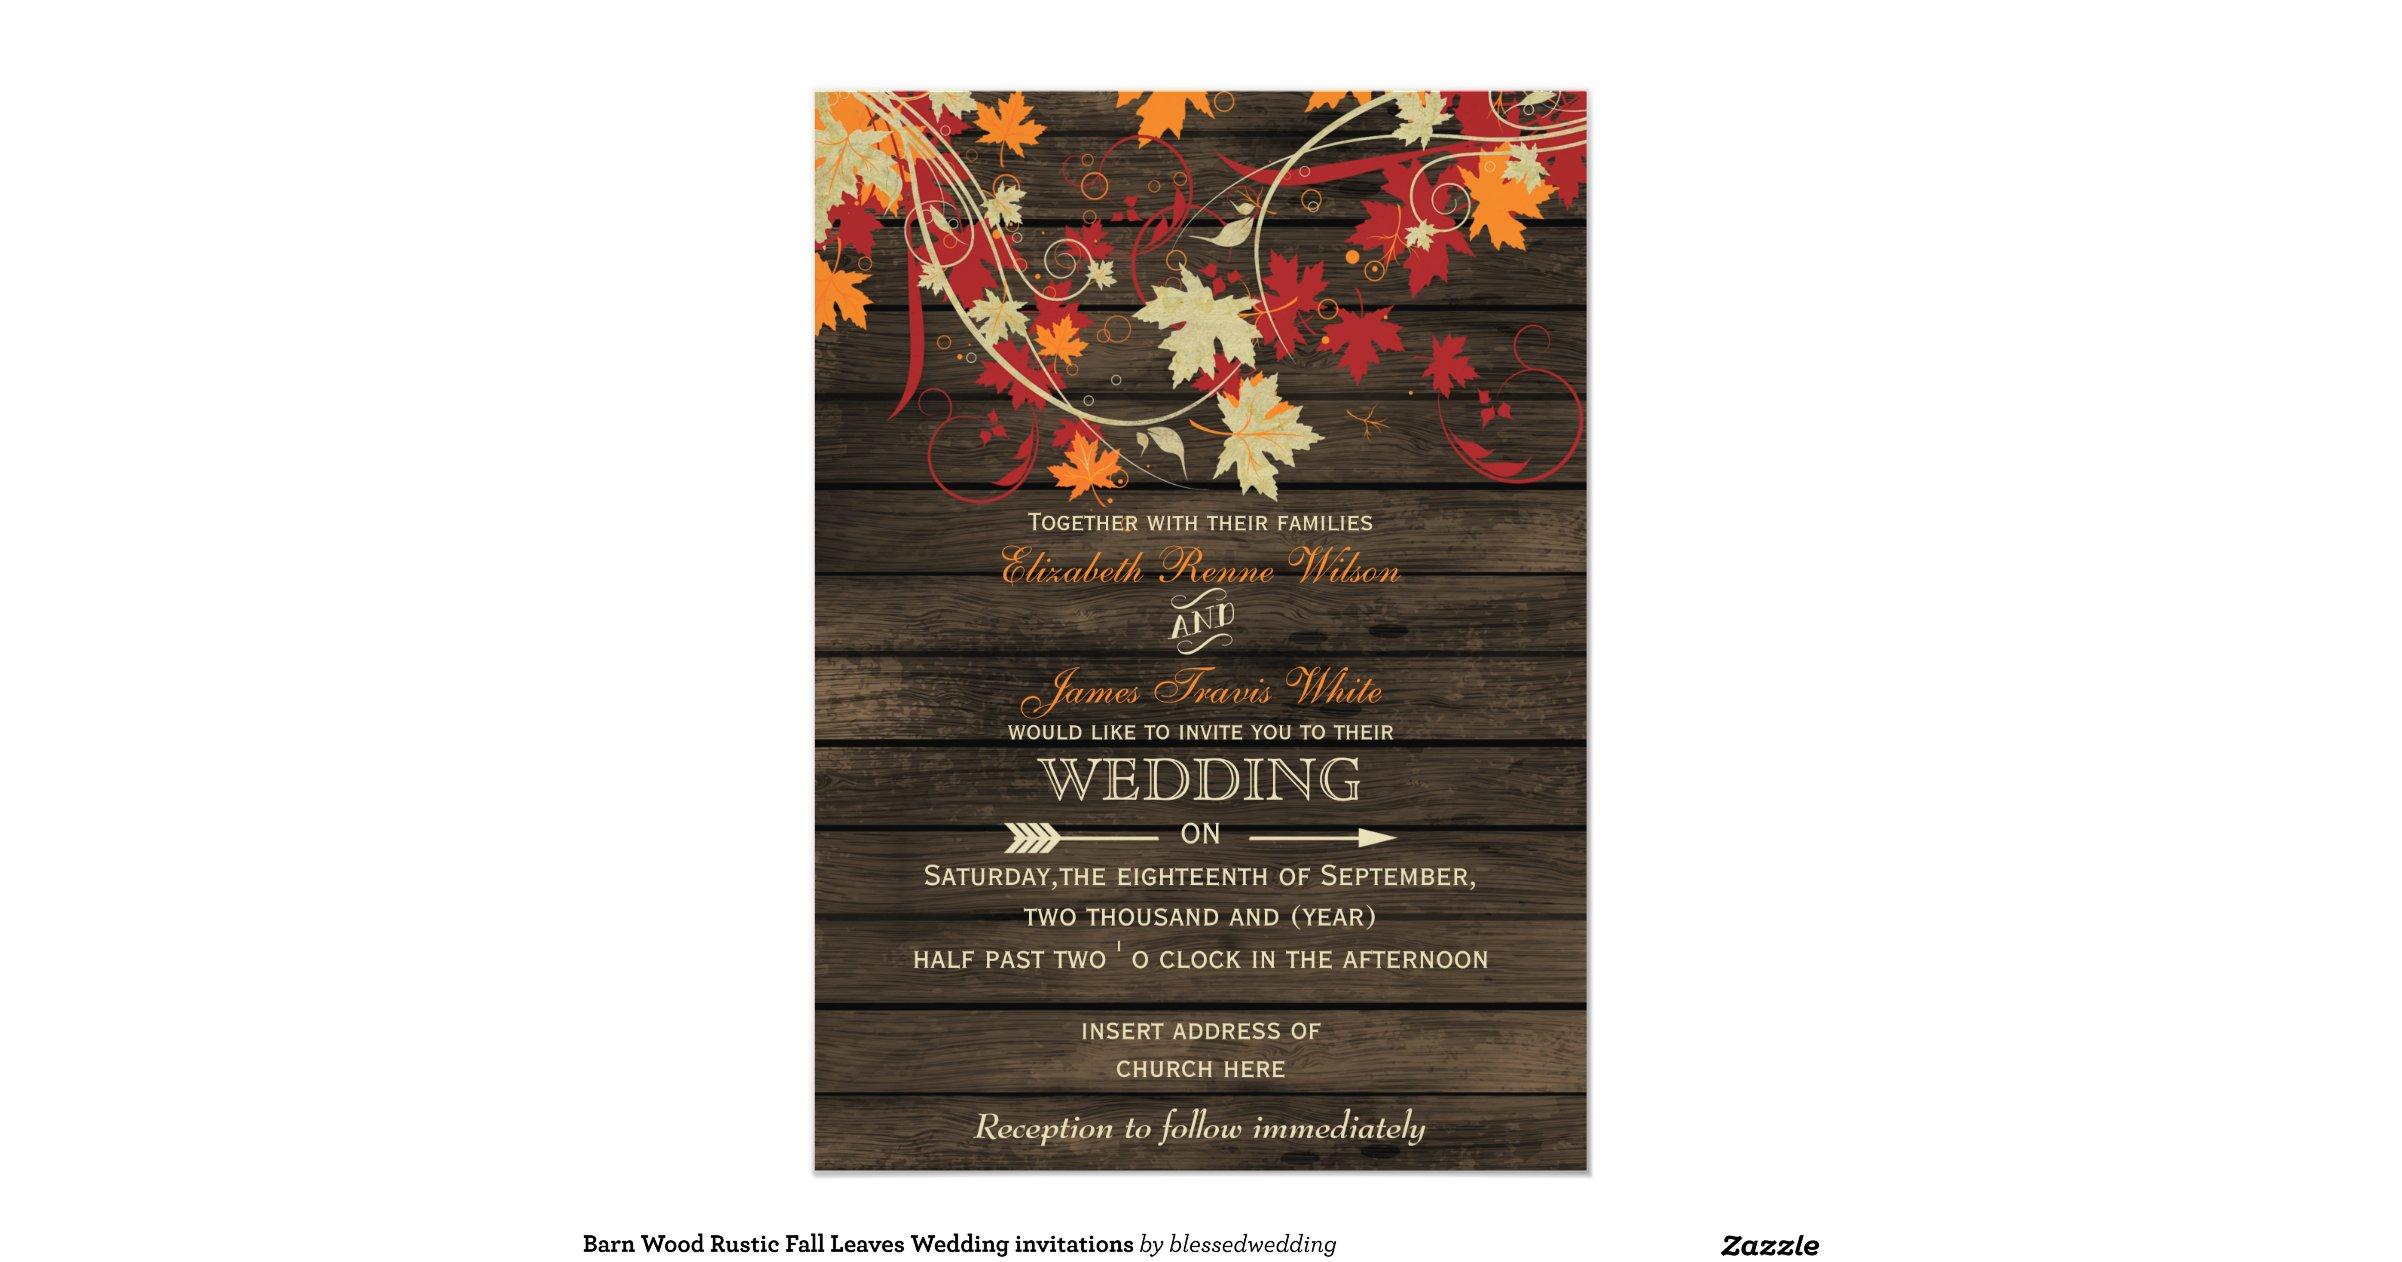 Rustic Fall Wedding Invitations: Barnwood, Rustic Fall Leaves Wedding Invitations